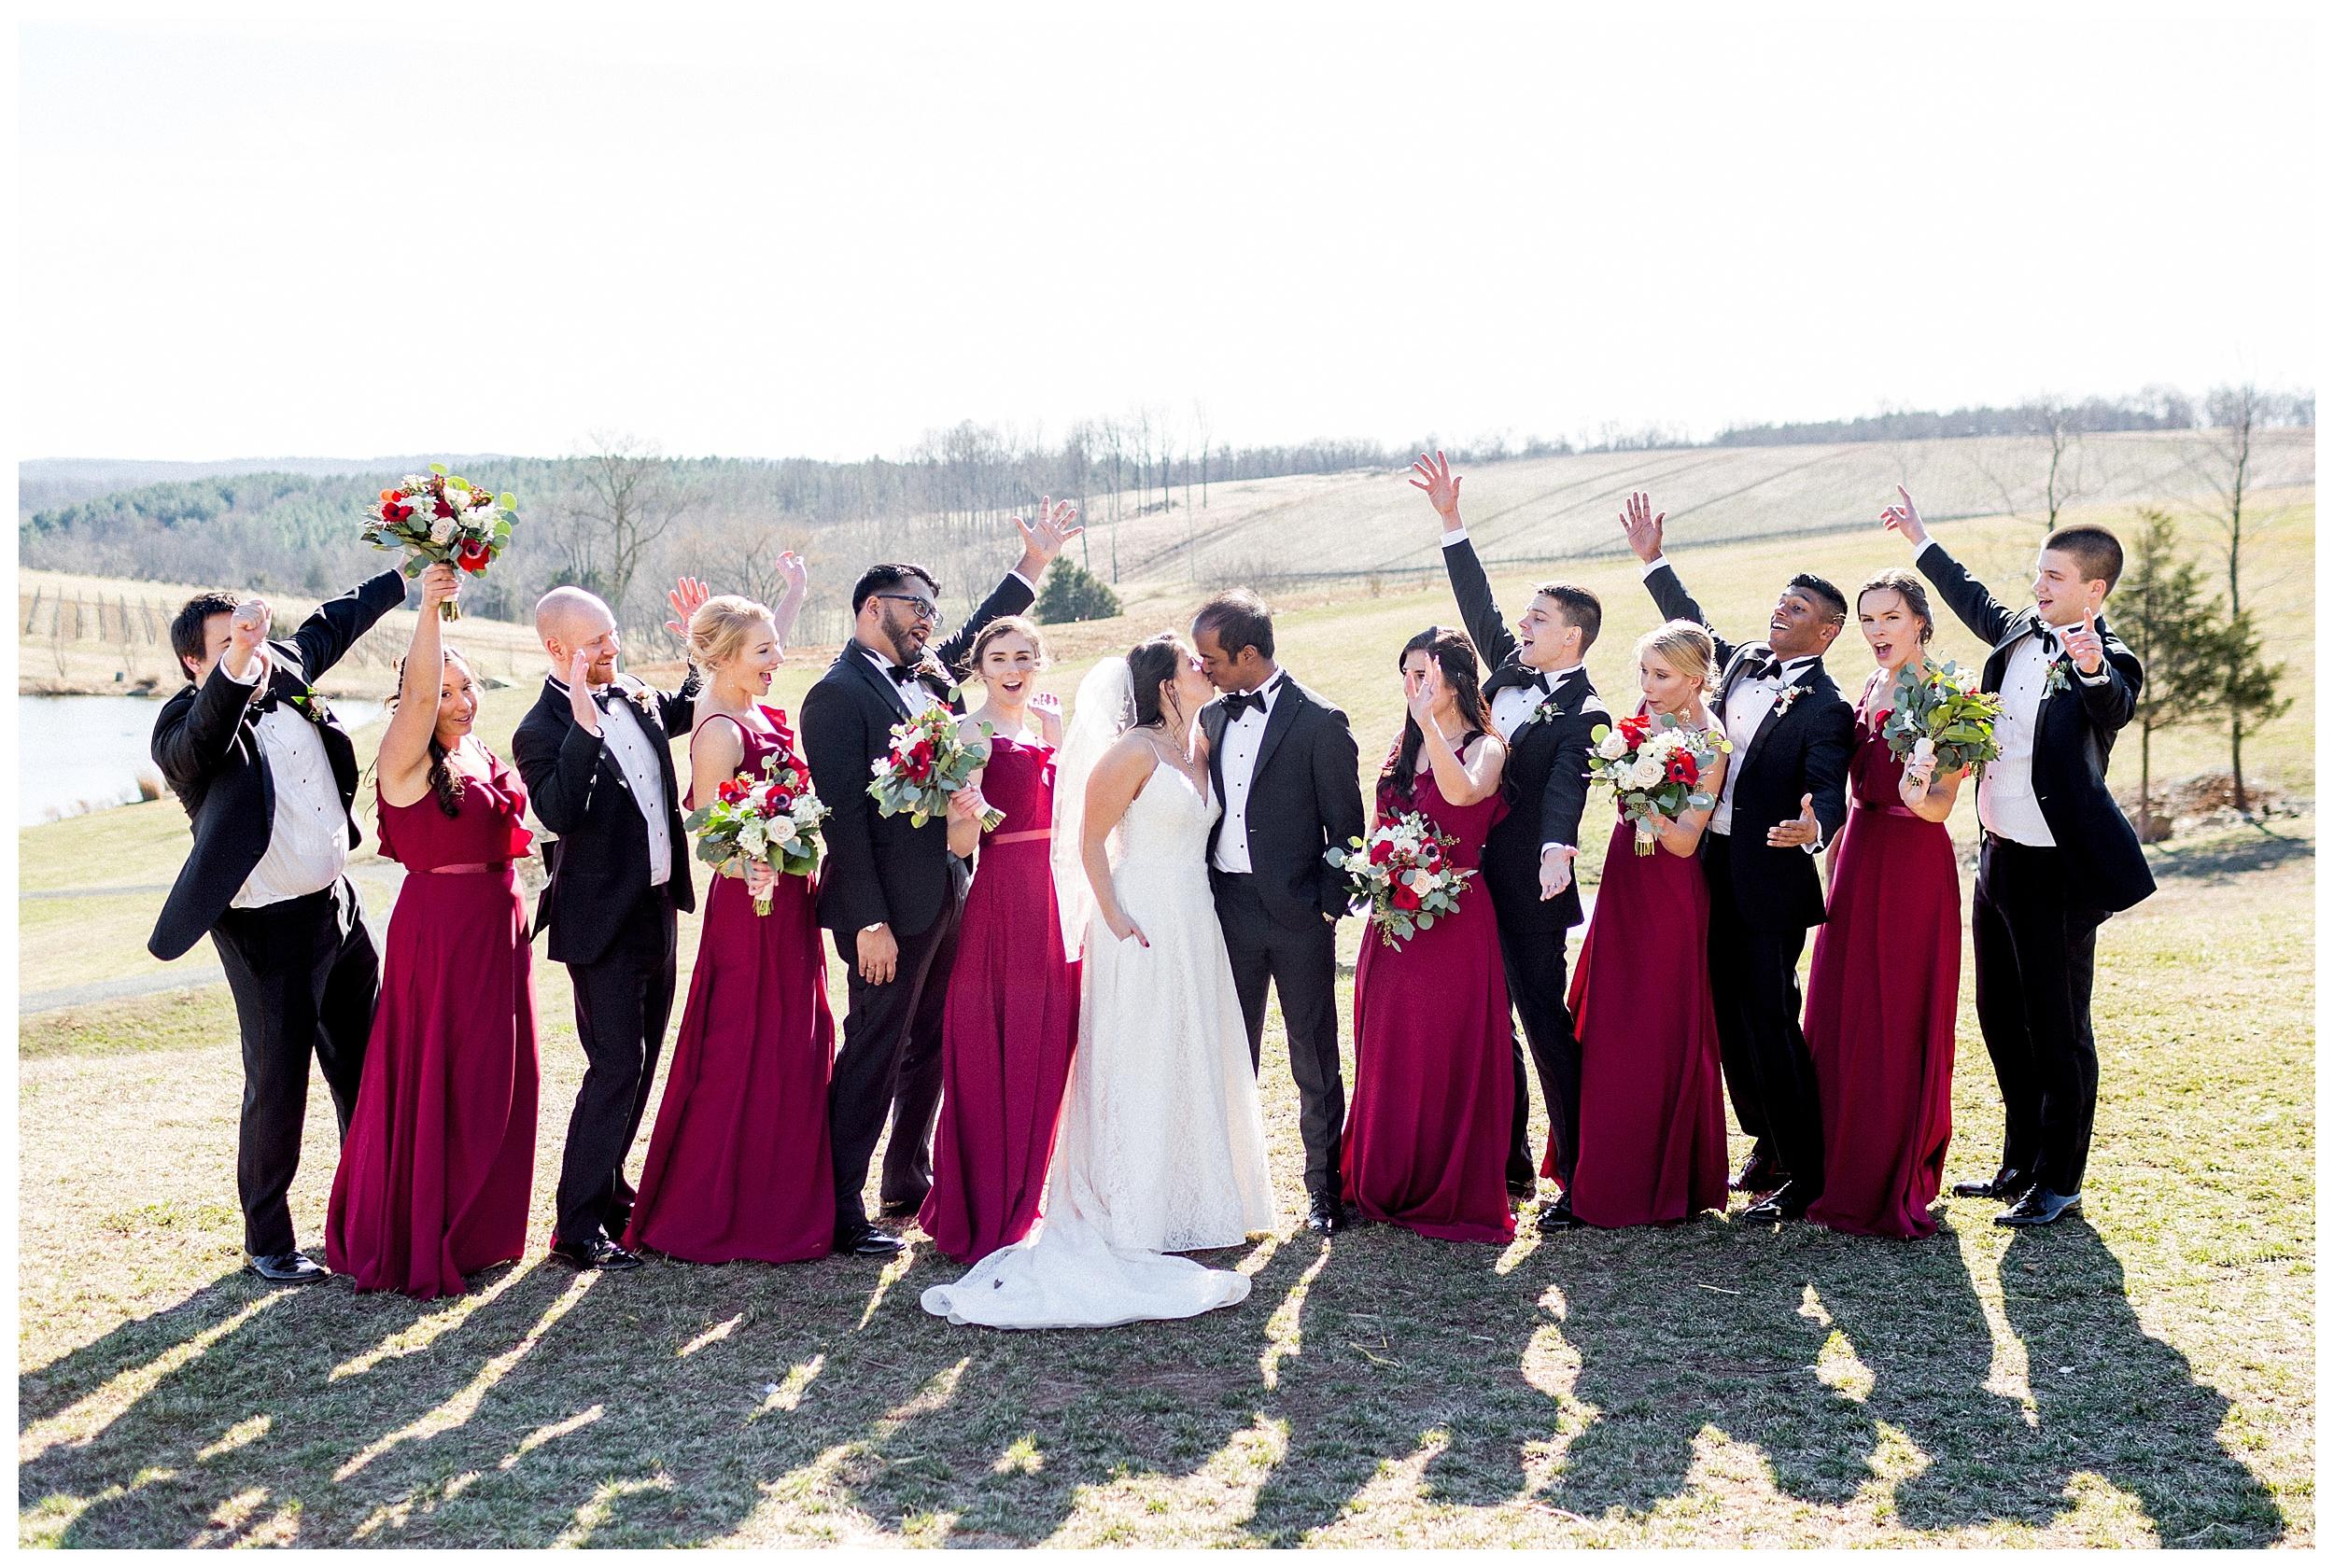 Stone Tower Winery Wedding | Virginia Winter Wedding | VA Wedding Photographer Kir Tuben_0072.jpg